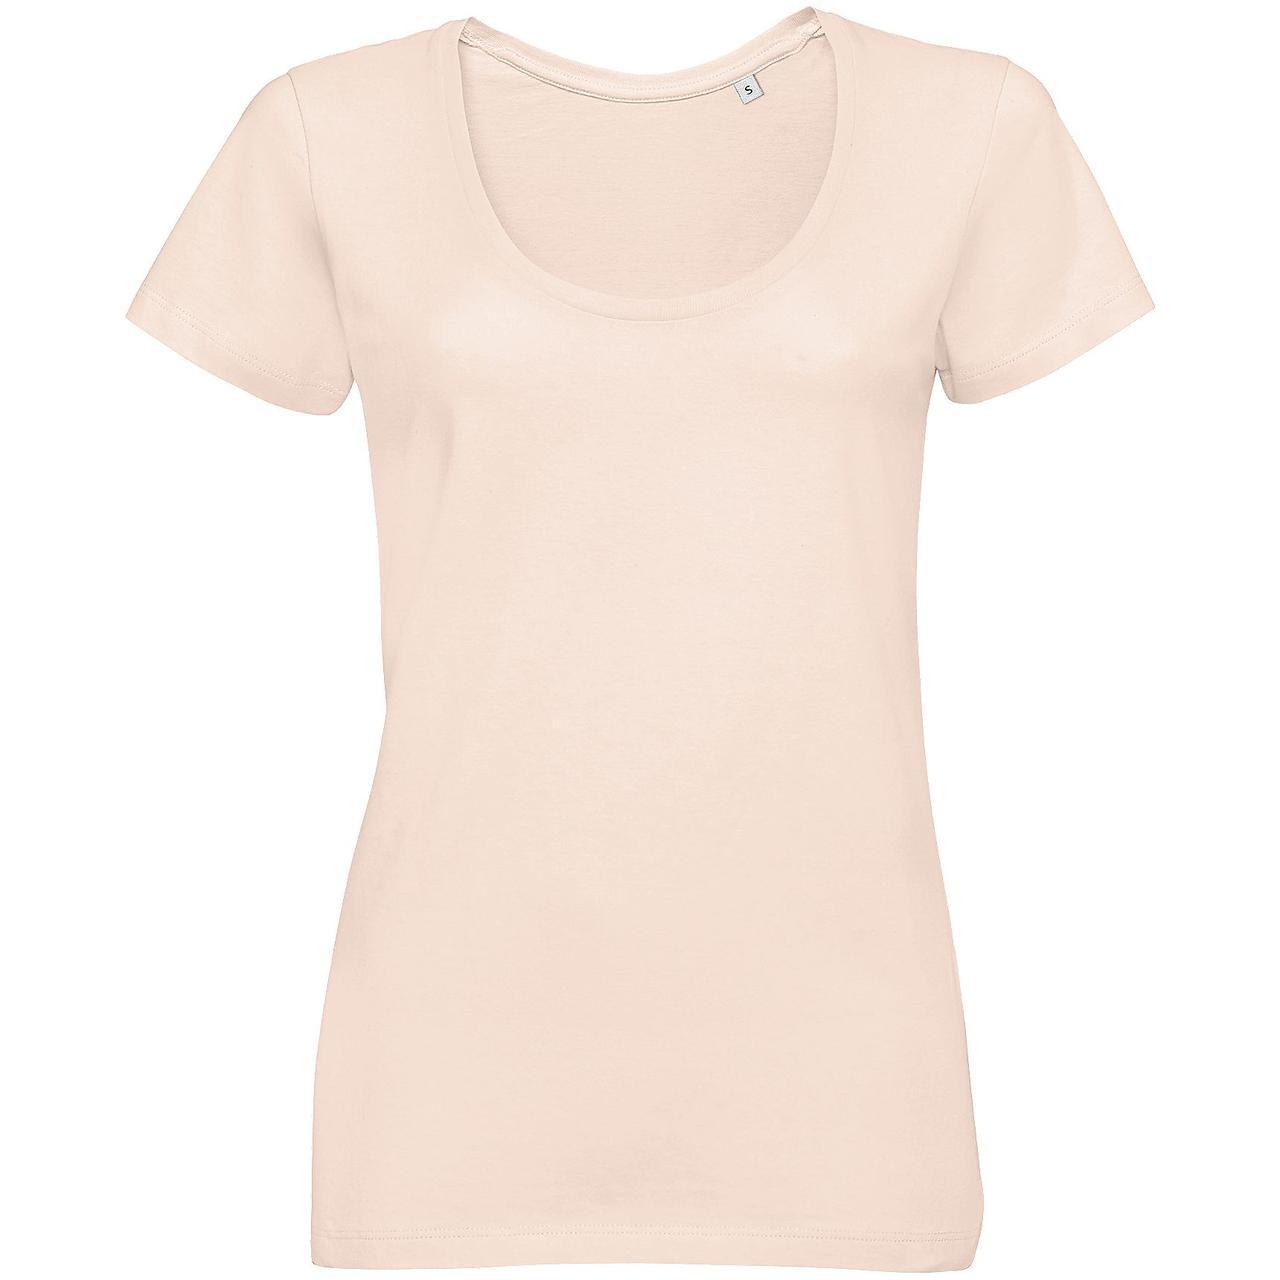 Футболка женская Metropolitan, светло-розовая (артикул 02079143)